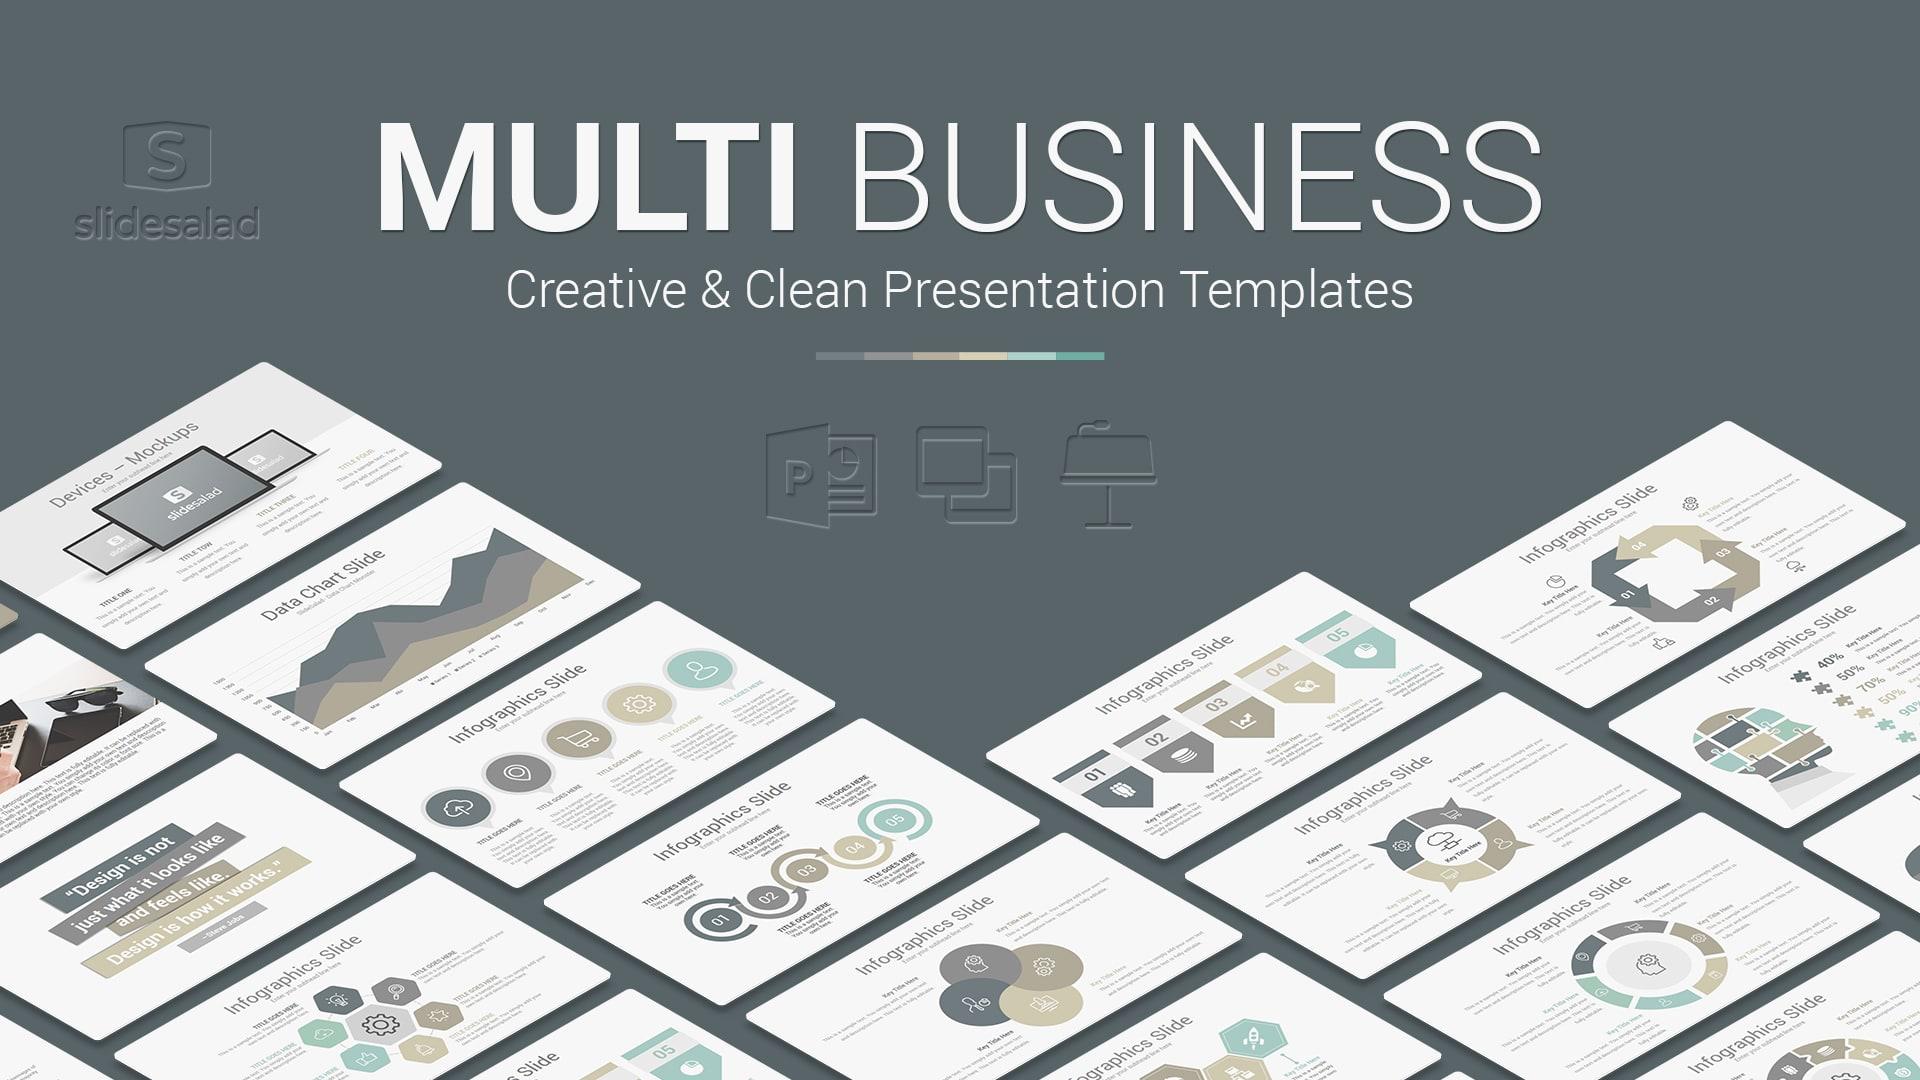 Multi Business Presentation Templates